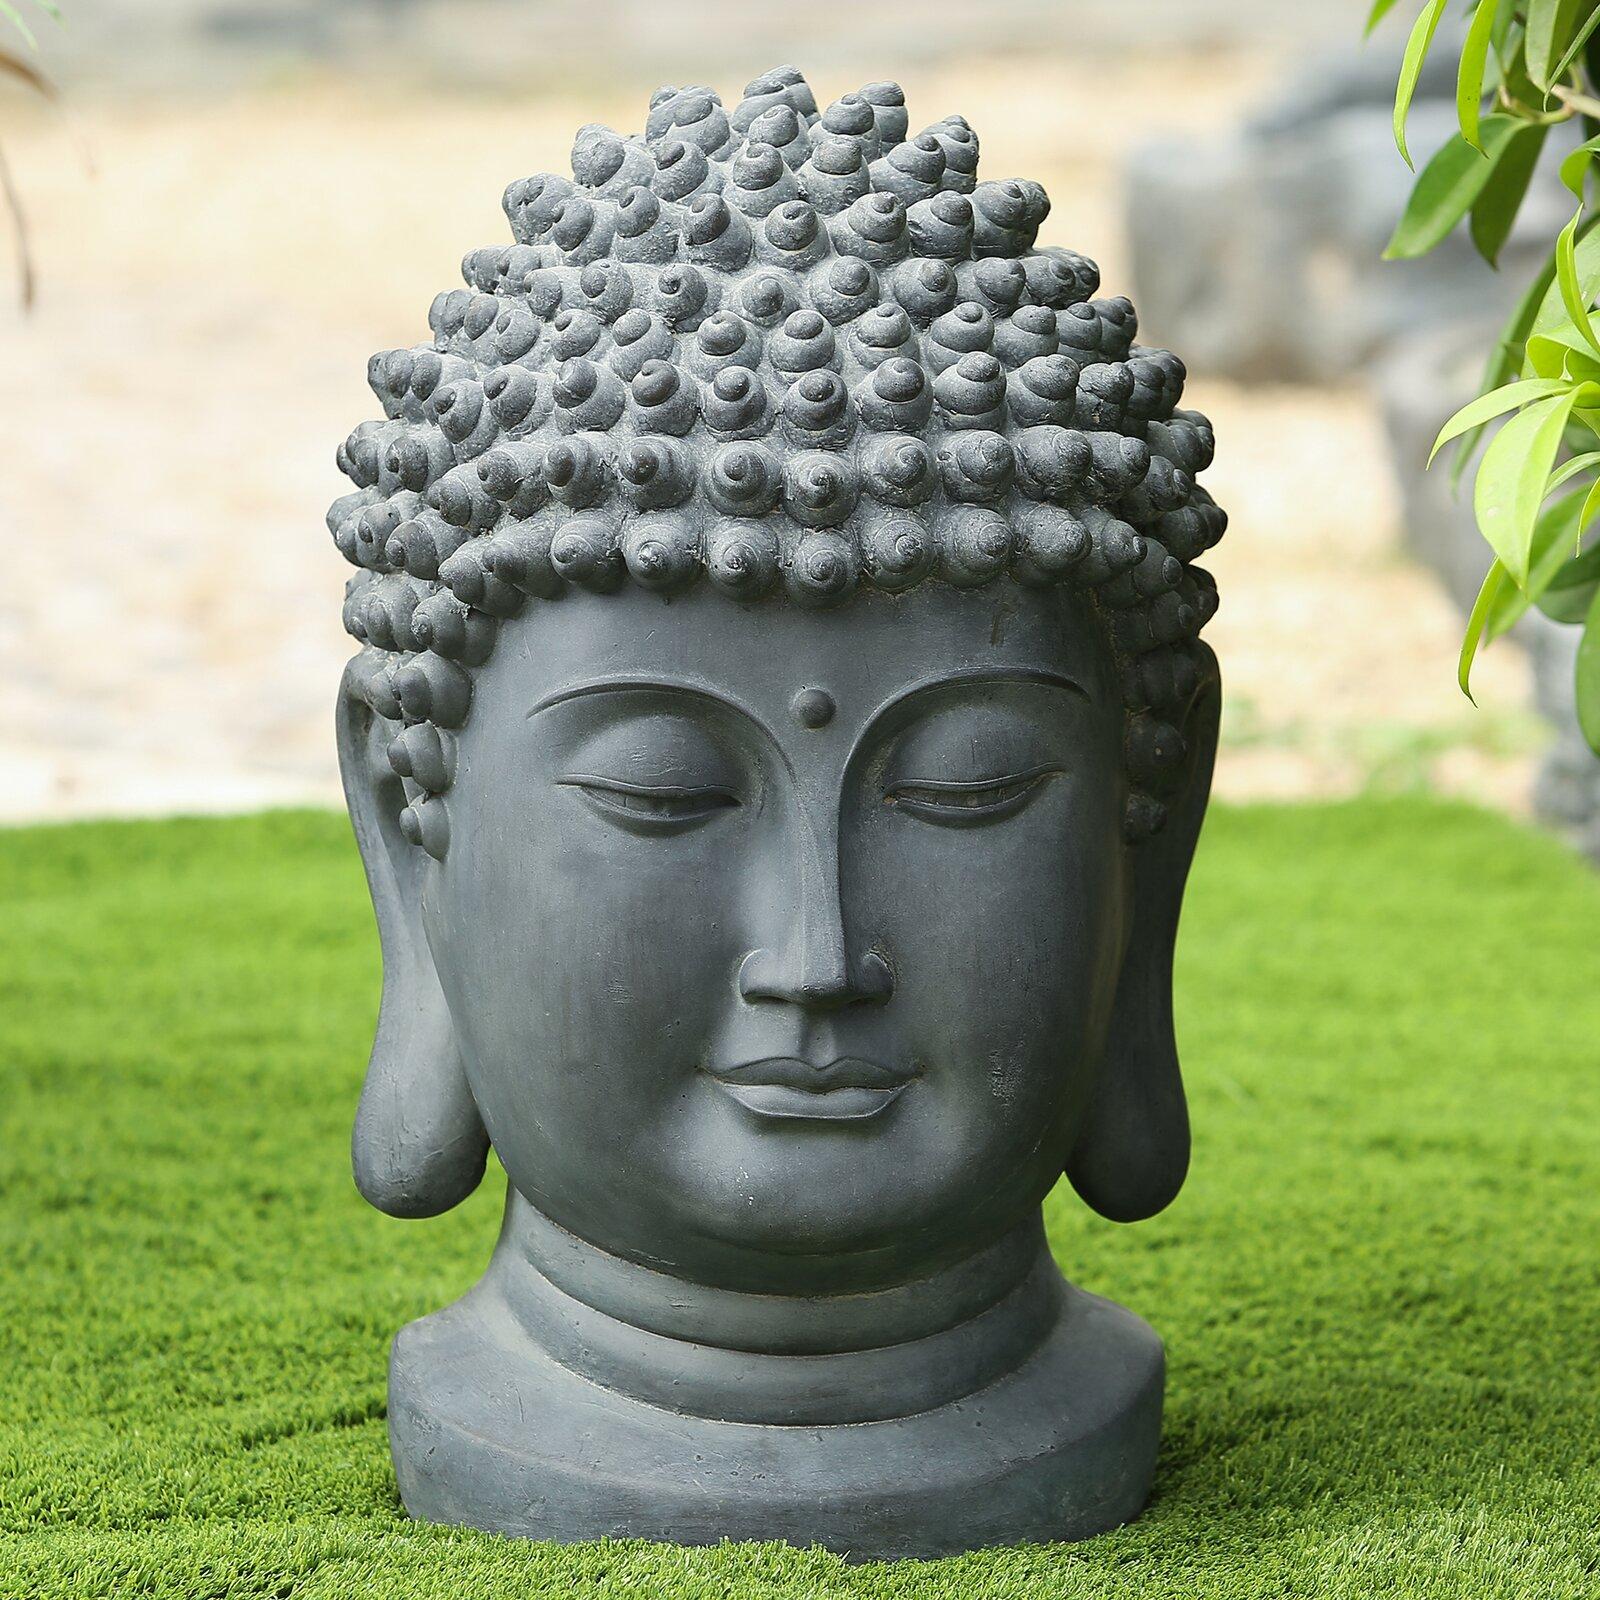 garden-buddha-statue-head-fiberstone-20-inches-hollow-interior-peaceful-outdoor-decoration-ideas-housewarming-gift-for-spirituality